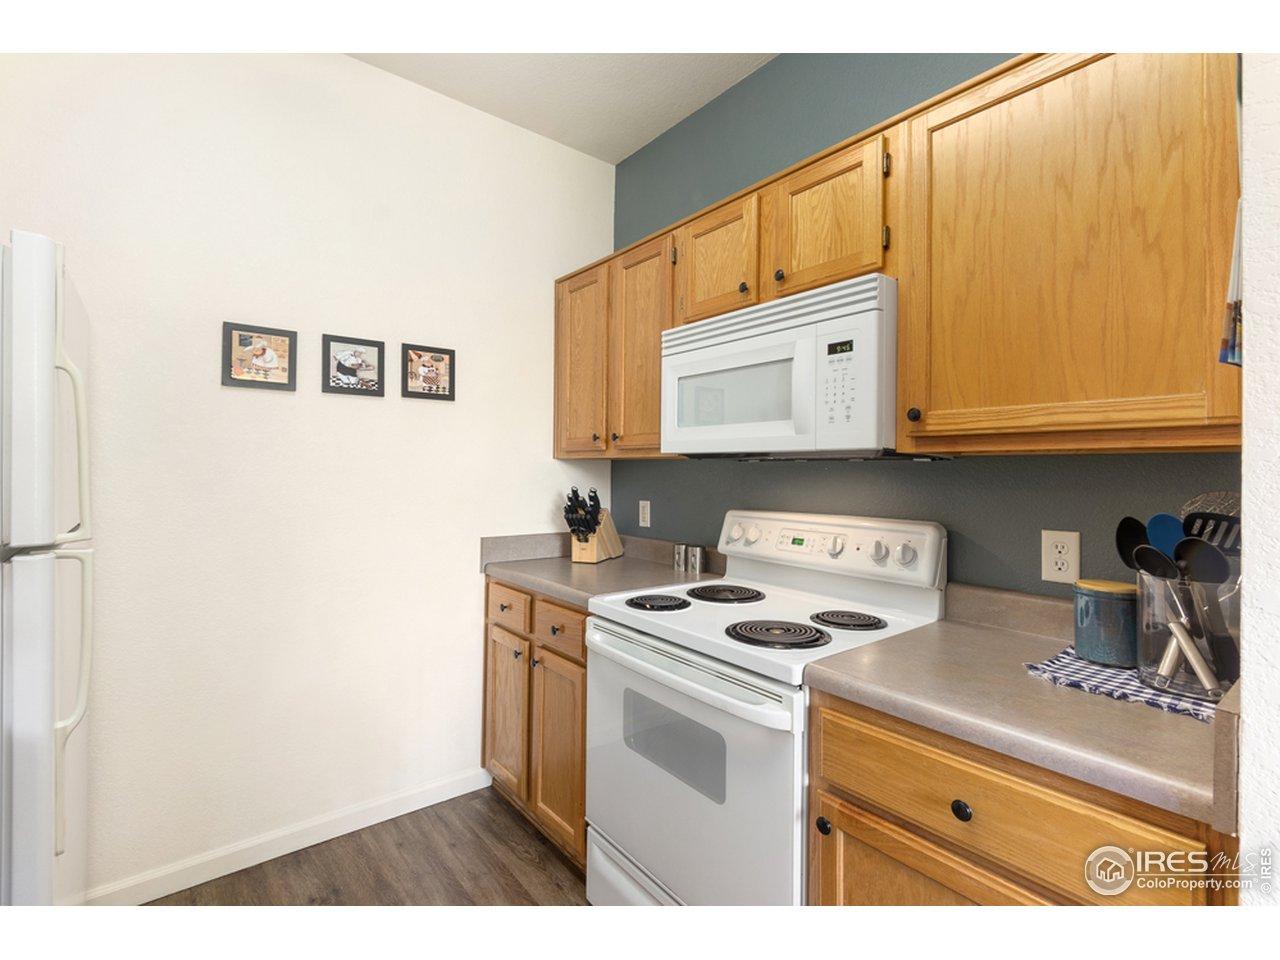 Efficient, spacious kitchen.